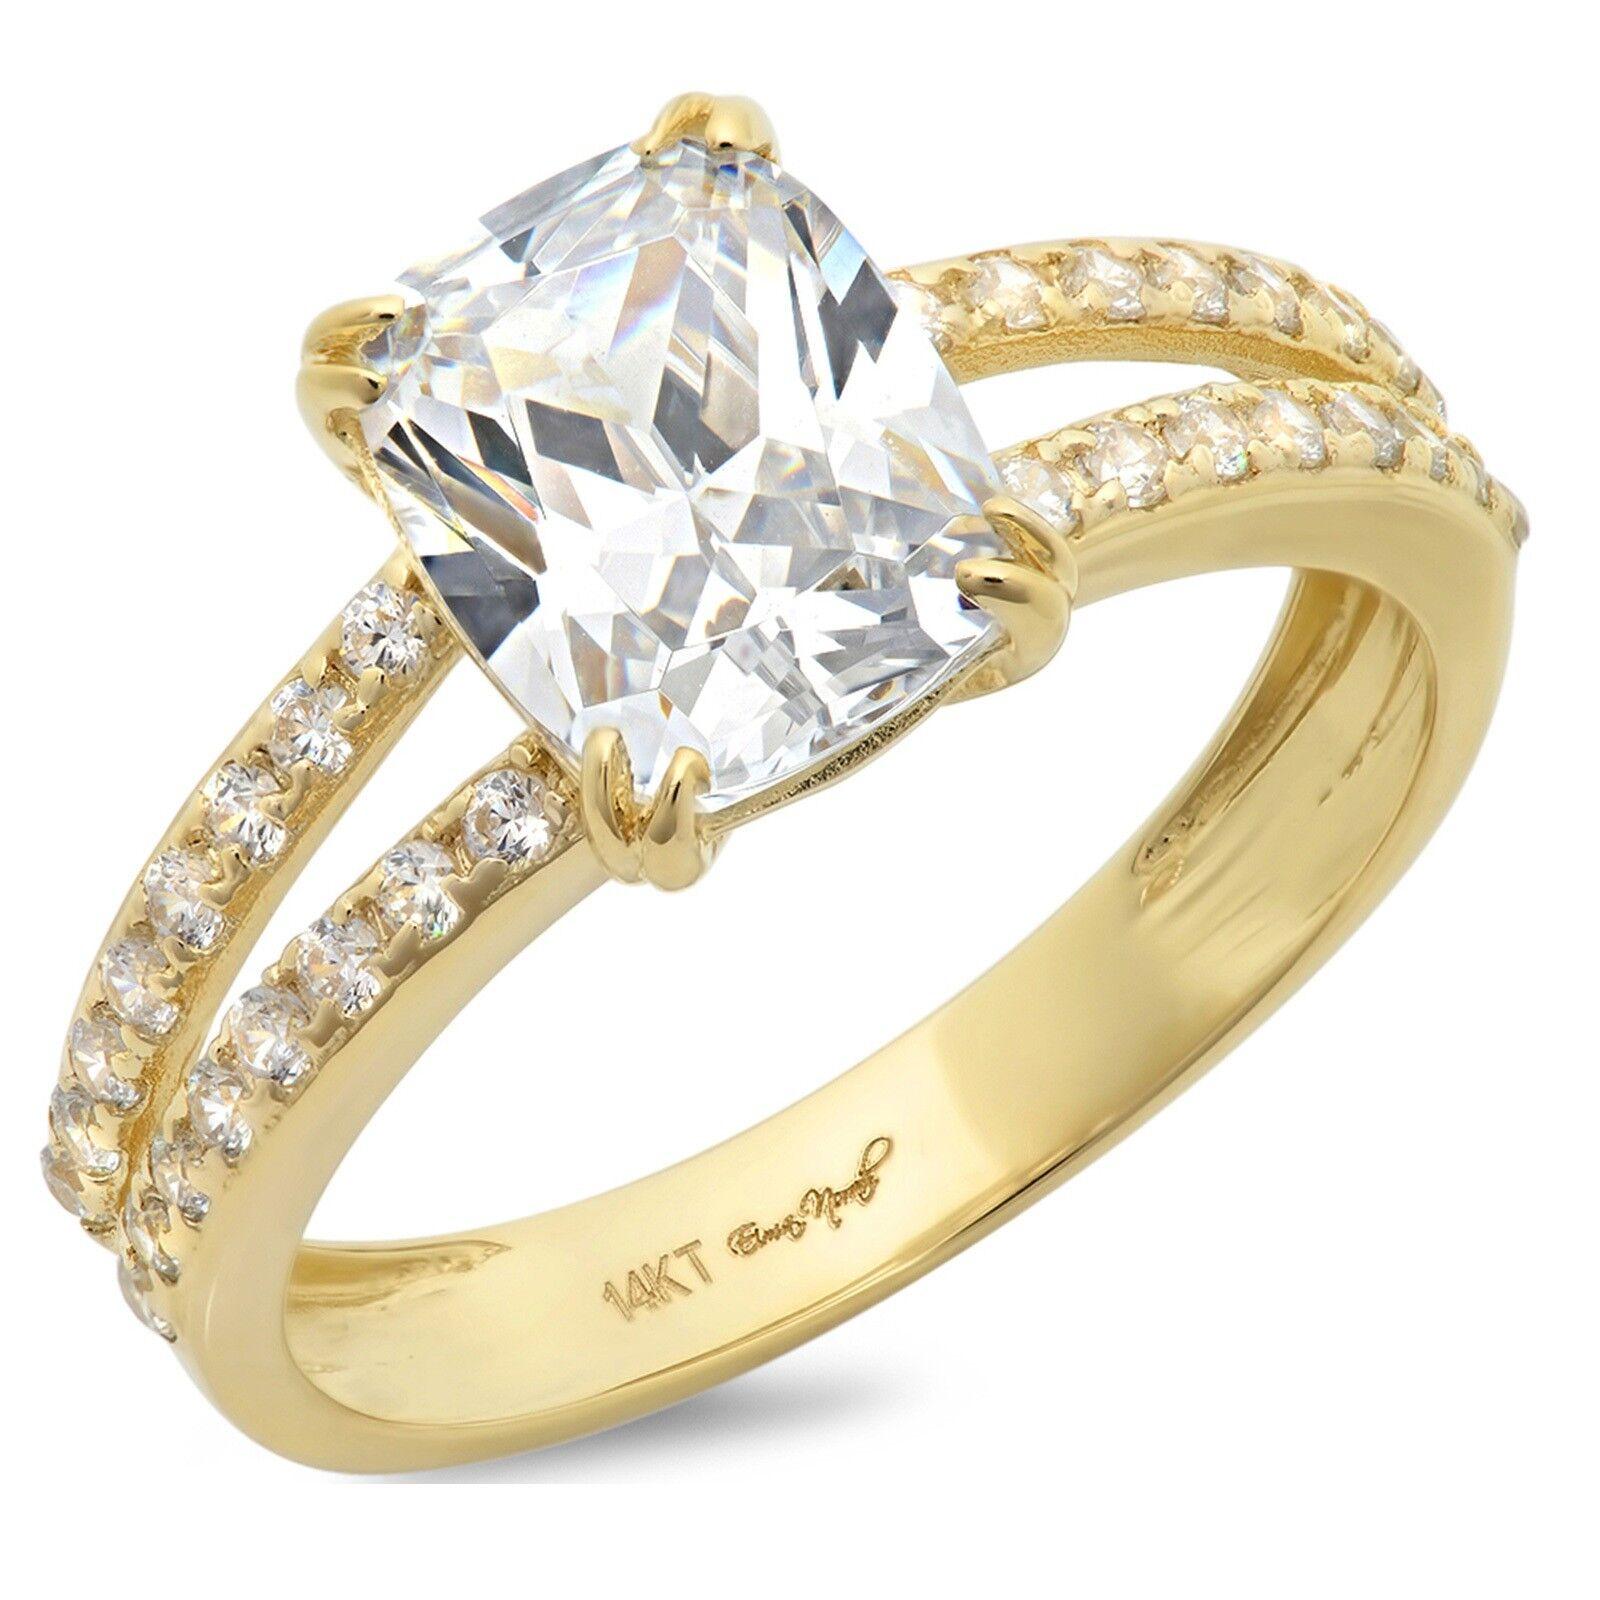 16b5d83e1452f Anniversary Engagement Bridal Wedding Cut Cushion 3.7ct Ring 14k ...